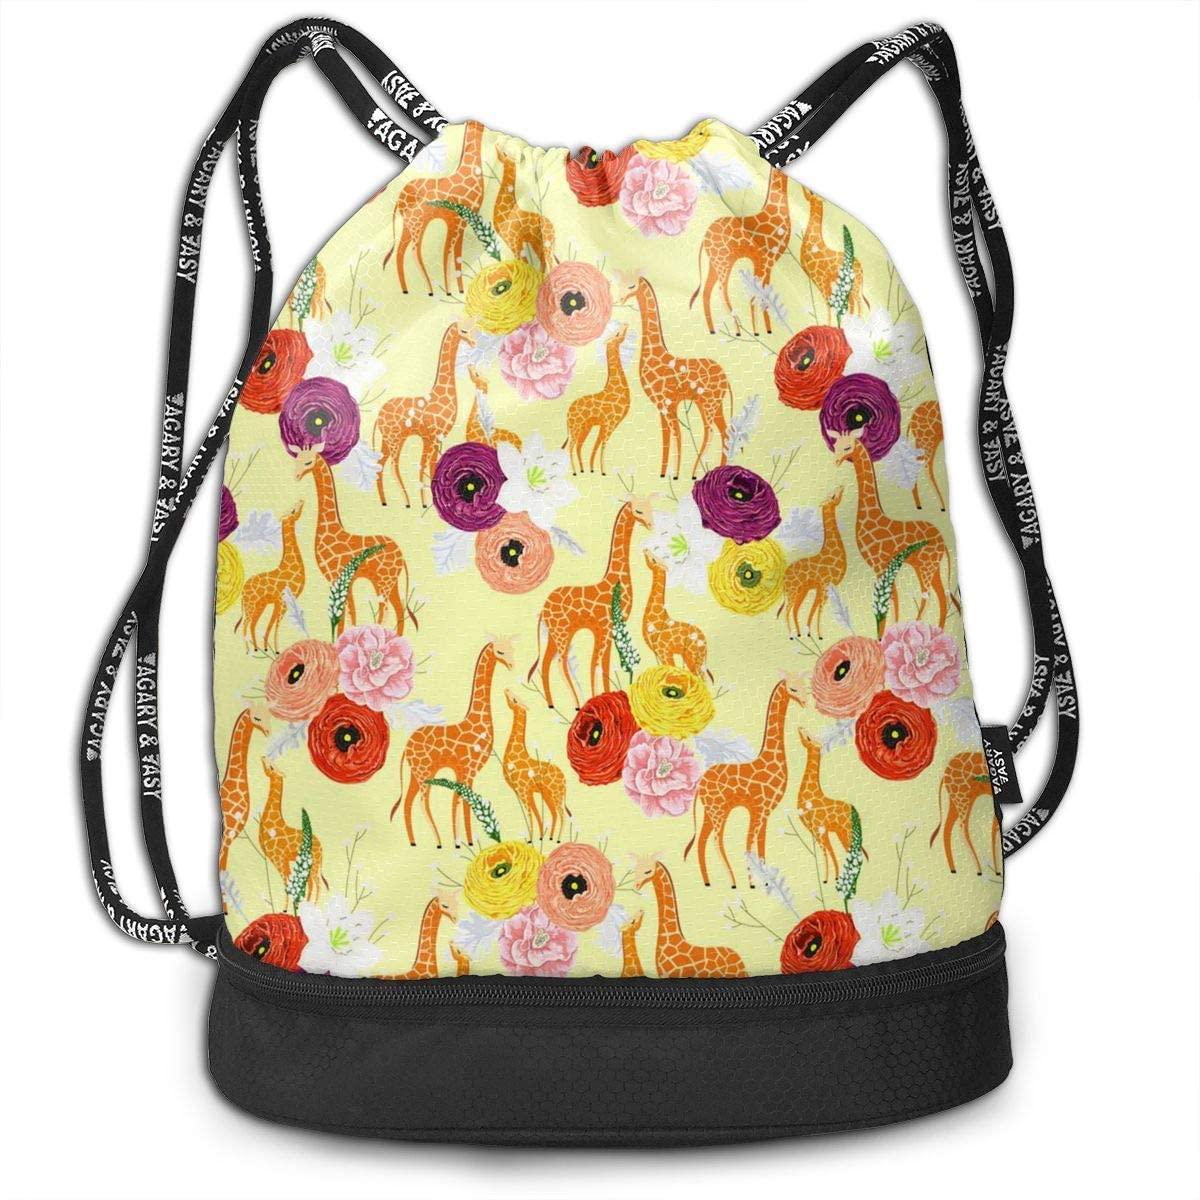 Bundle Backpacks Giraffe Mother Child Gym Sack Drawstring Bags Casual Daypack Yoga Bag School Training Pouch